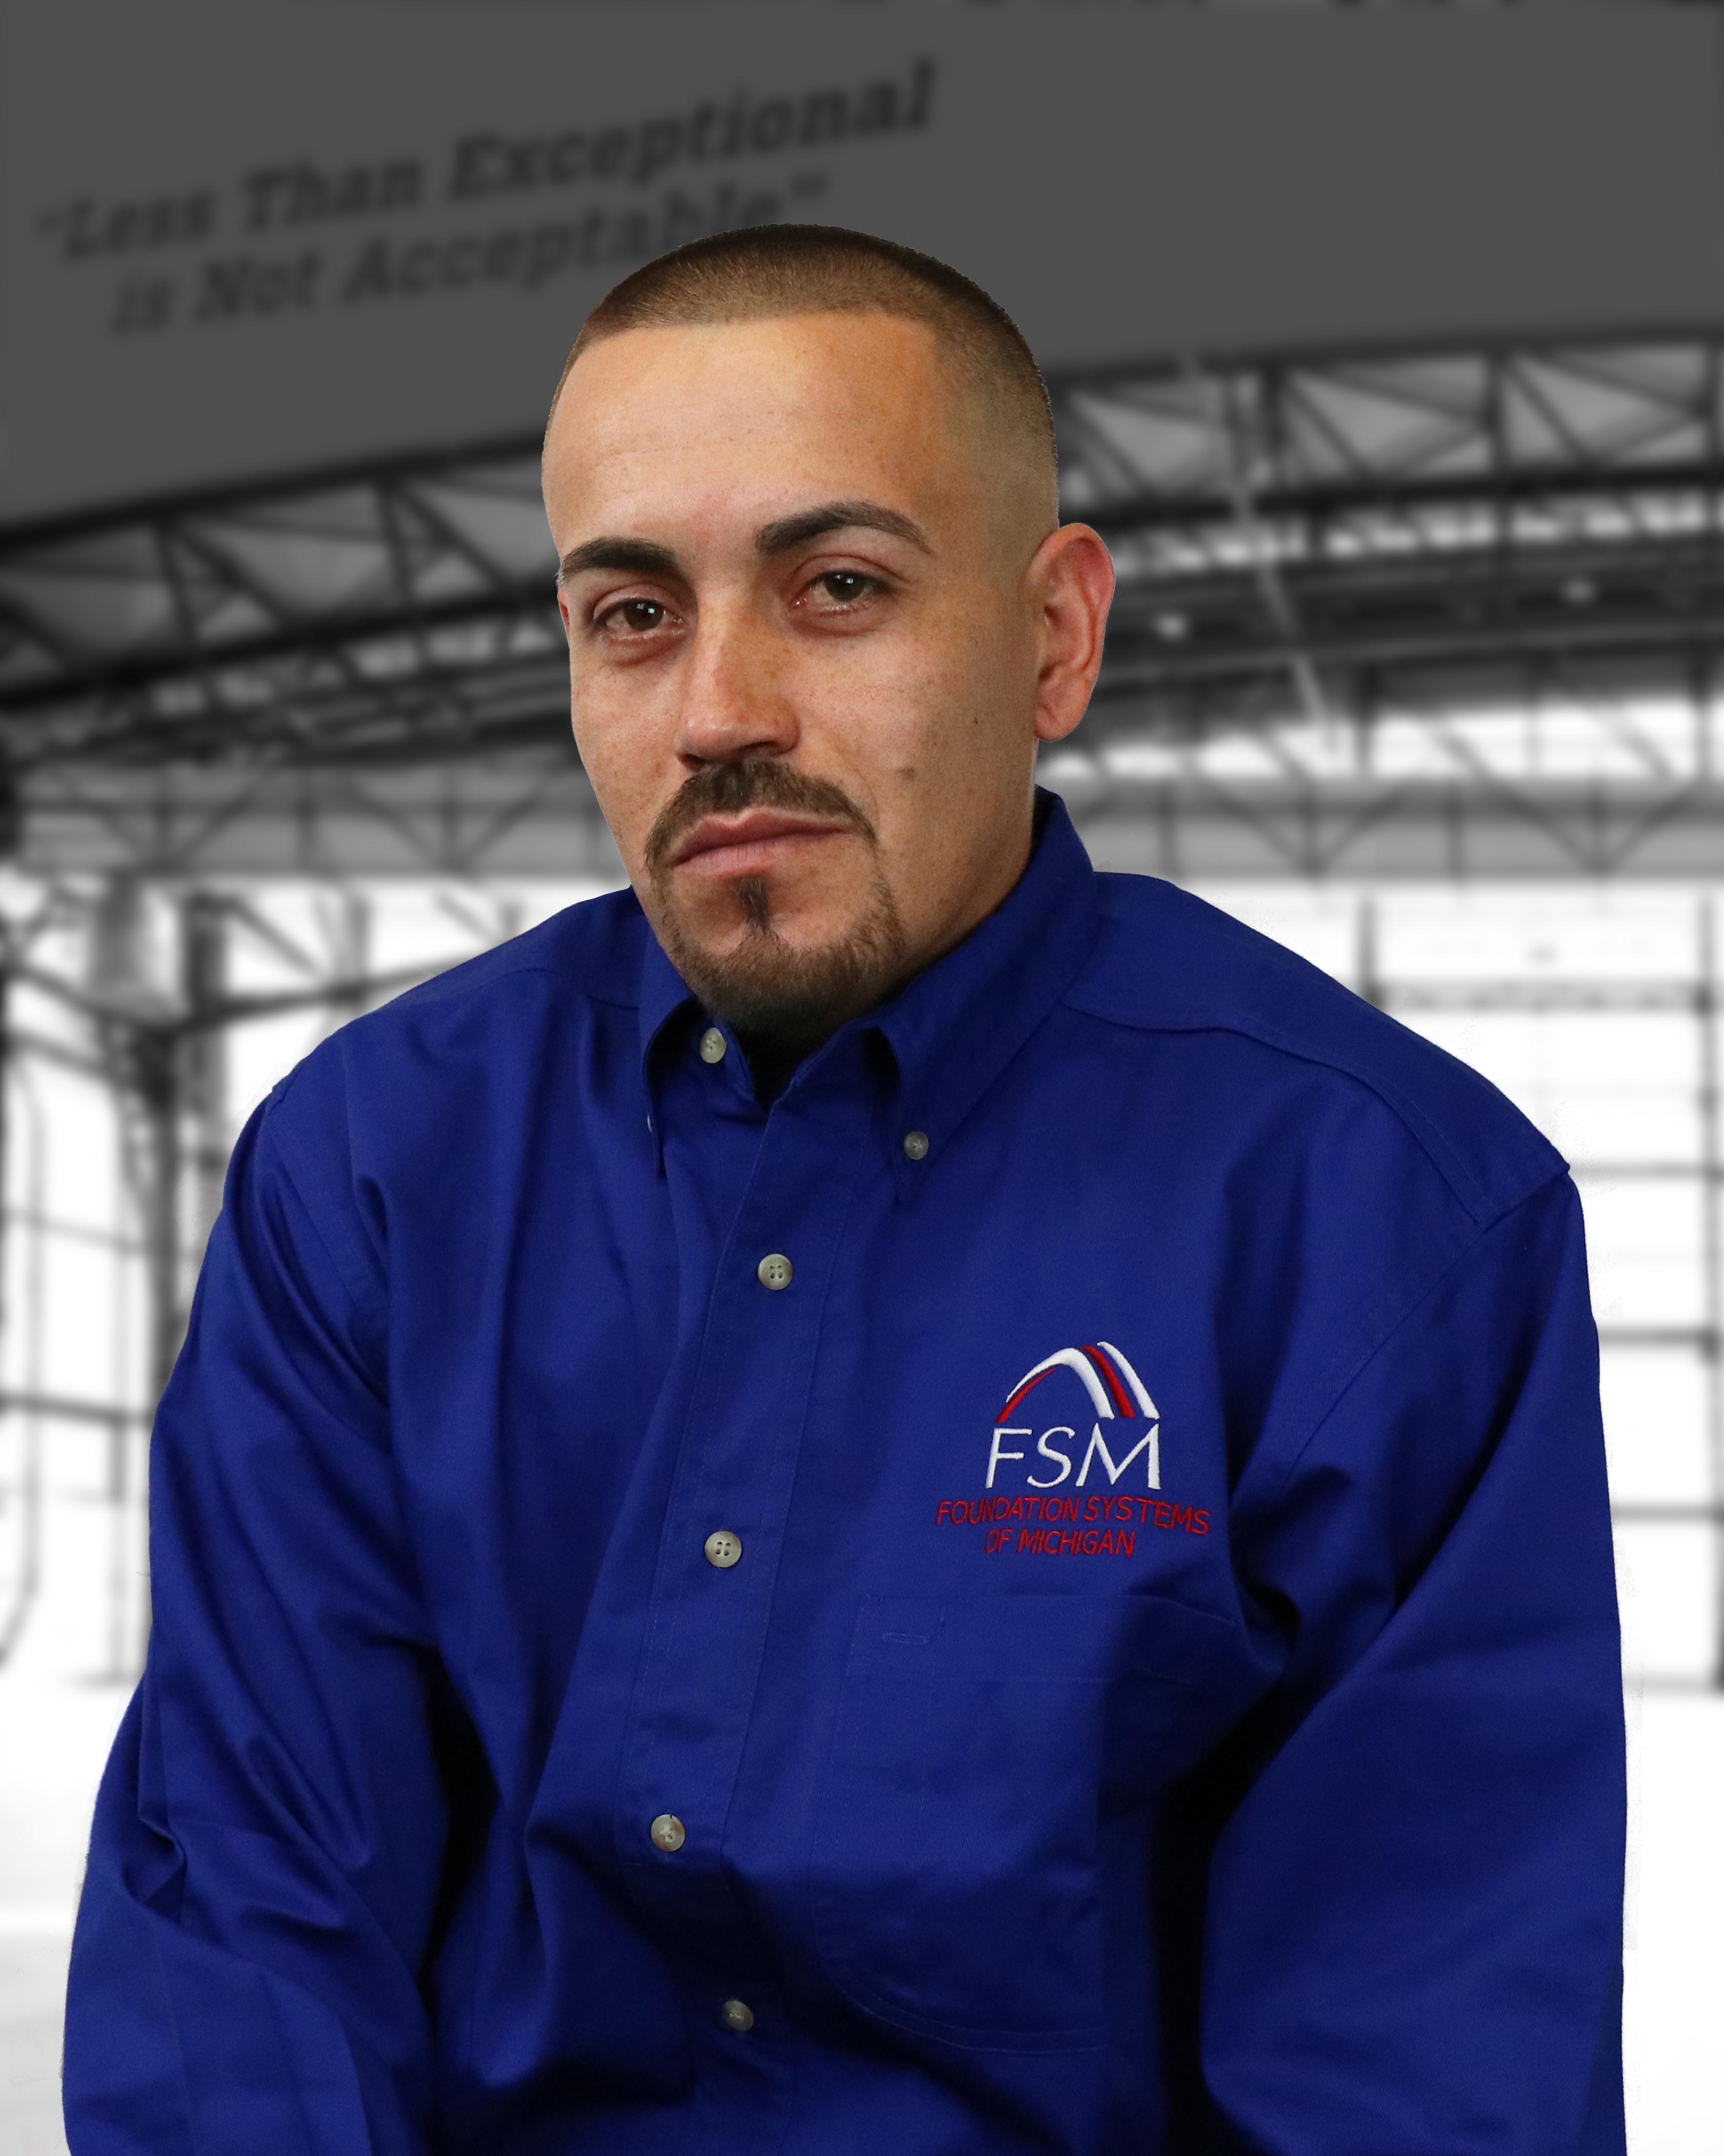 FSM Ricardo DeLatorre Foreman